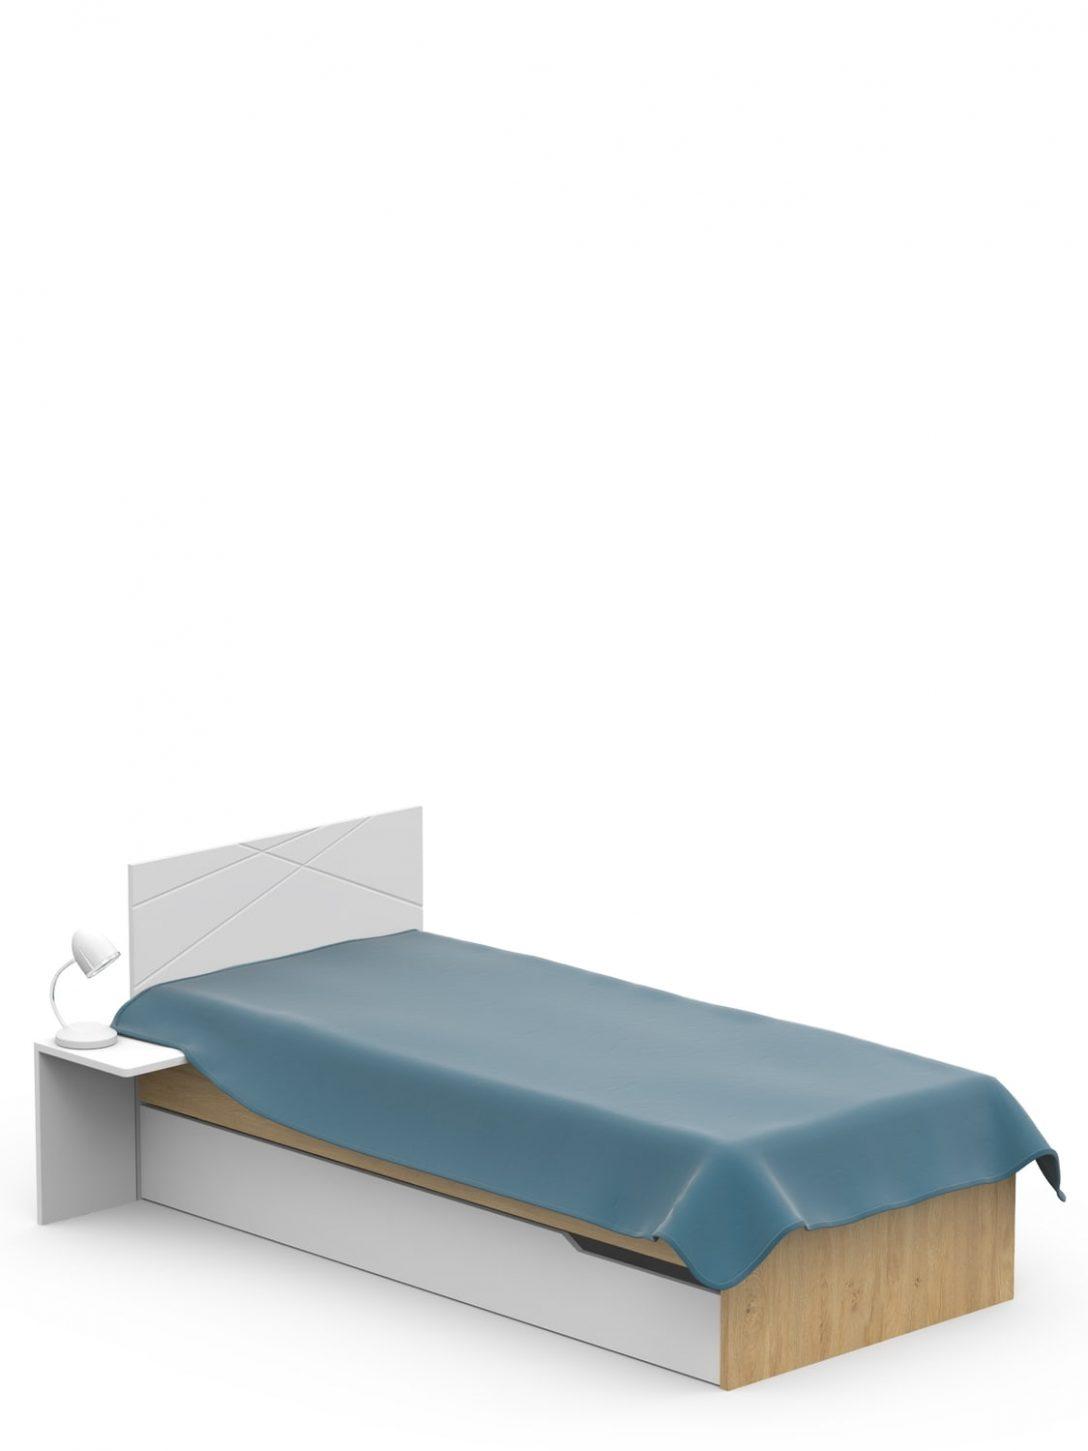 Full Size of Tojo V Bett Sitzbank 120x200 Oak Meblik Gnstig Kaufen 140x200 Mit Trends Betten Schubladen 90x200 Weiß Cars Massivholz Bad Renovieren Ohne Fliesen 200x200 Bett Tojo V Bett